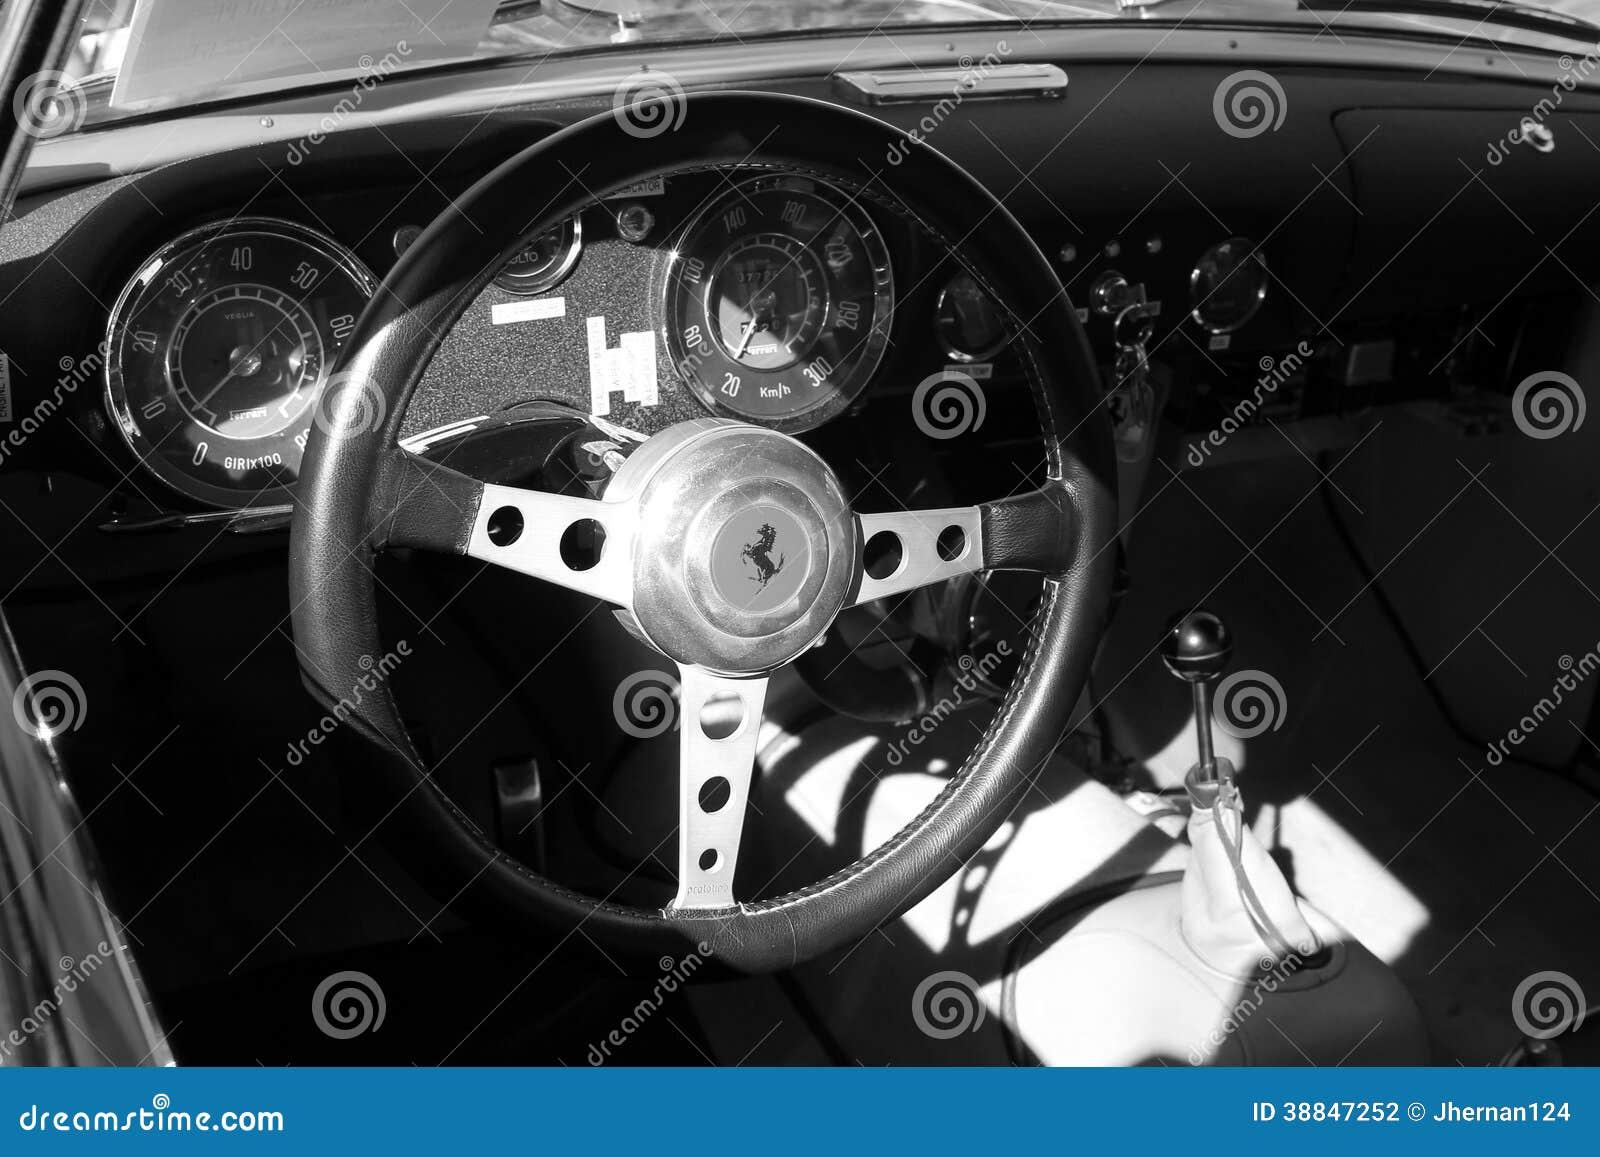 vintage ferrari sports car interior close up b w editorial photography image 38847252. Black Bedroom Furniture Sets. Home Design Ideas